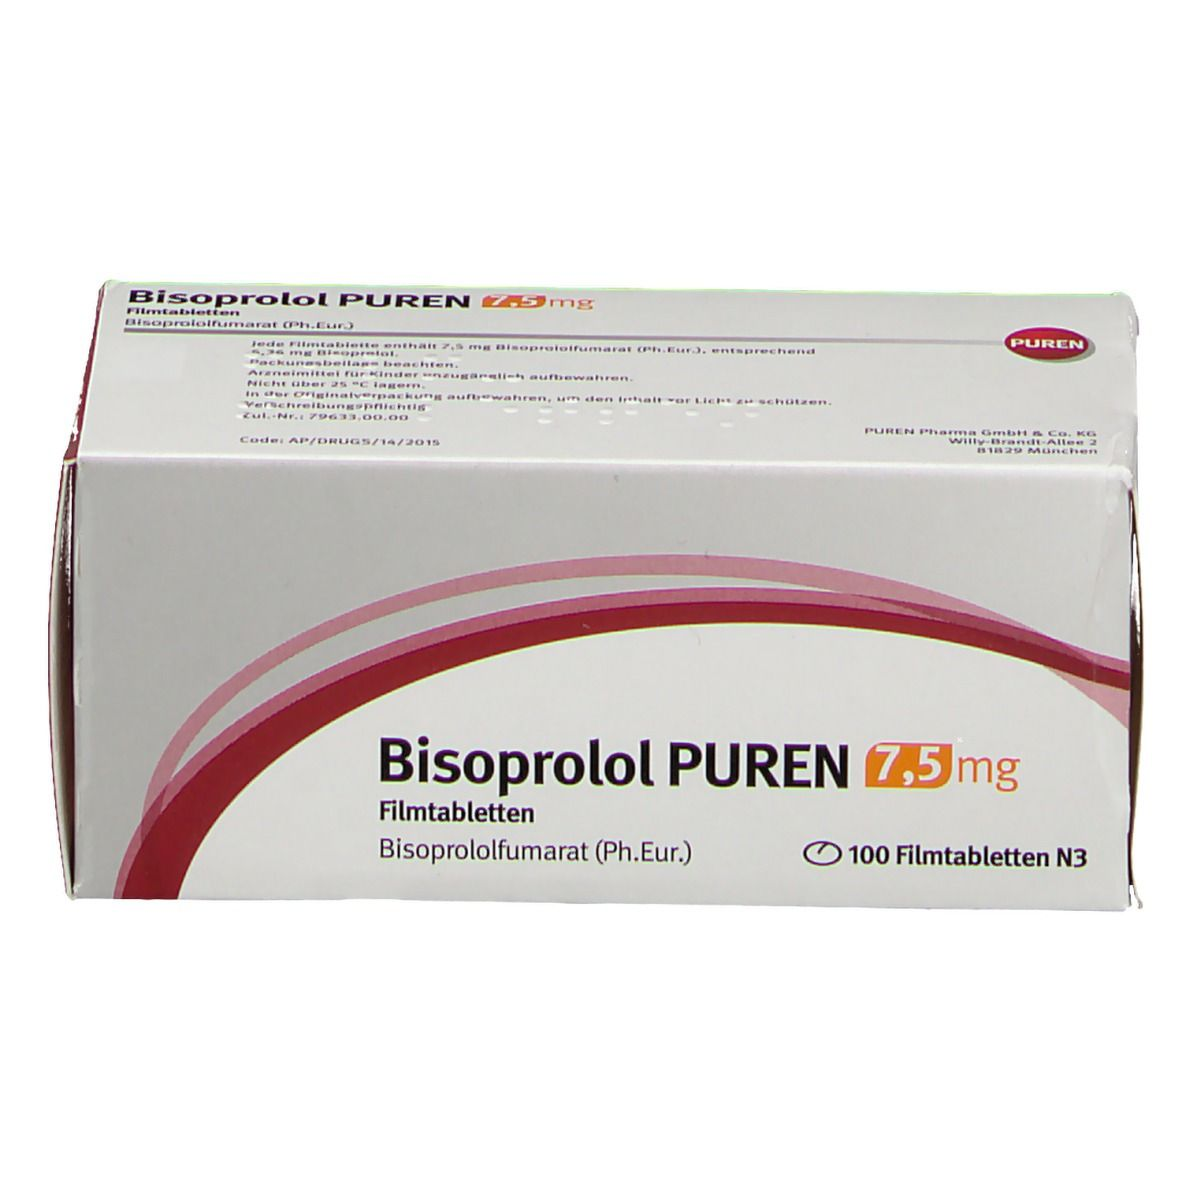 BISOPROLOL PUREN 7,5 mg Filmtabletten